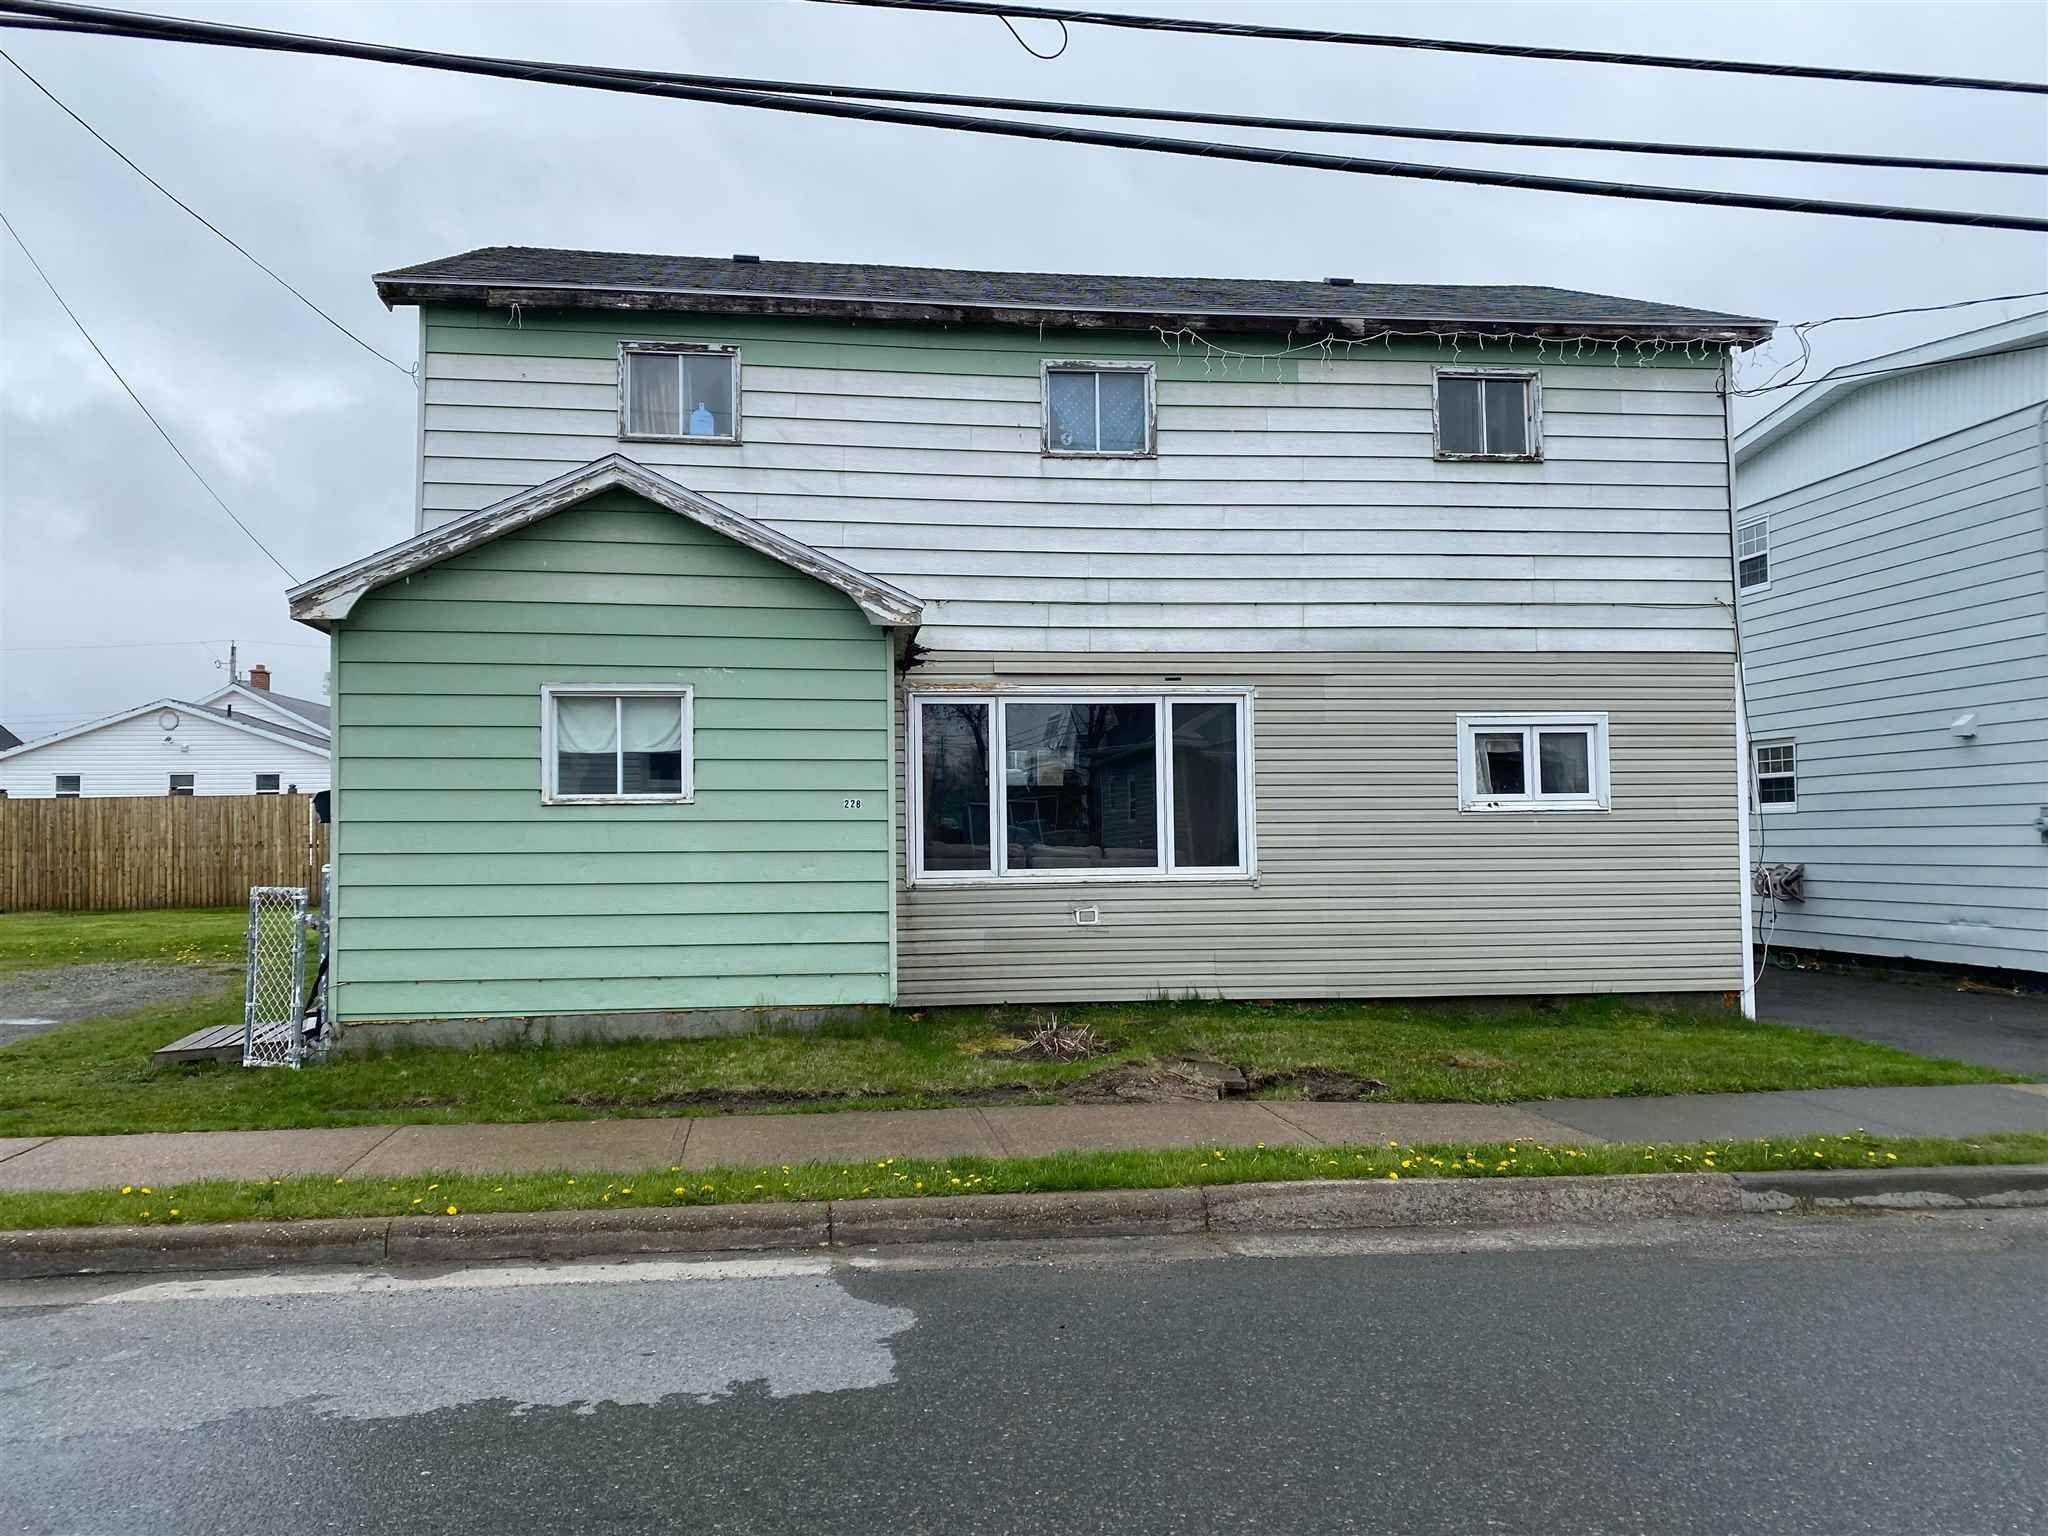 Main Photo: 228 Henry Street in Sydney: 201-Sydney Residential for sale (Cape Breton)  : MLS®# 202112483